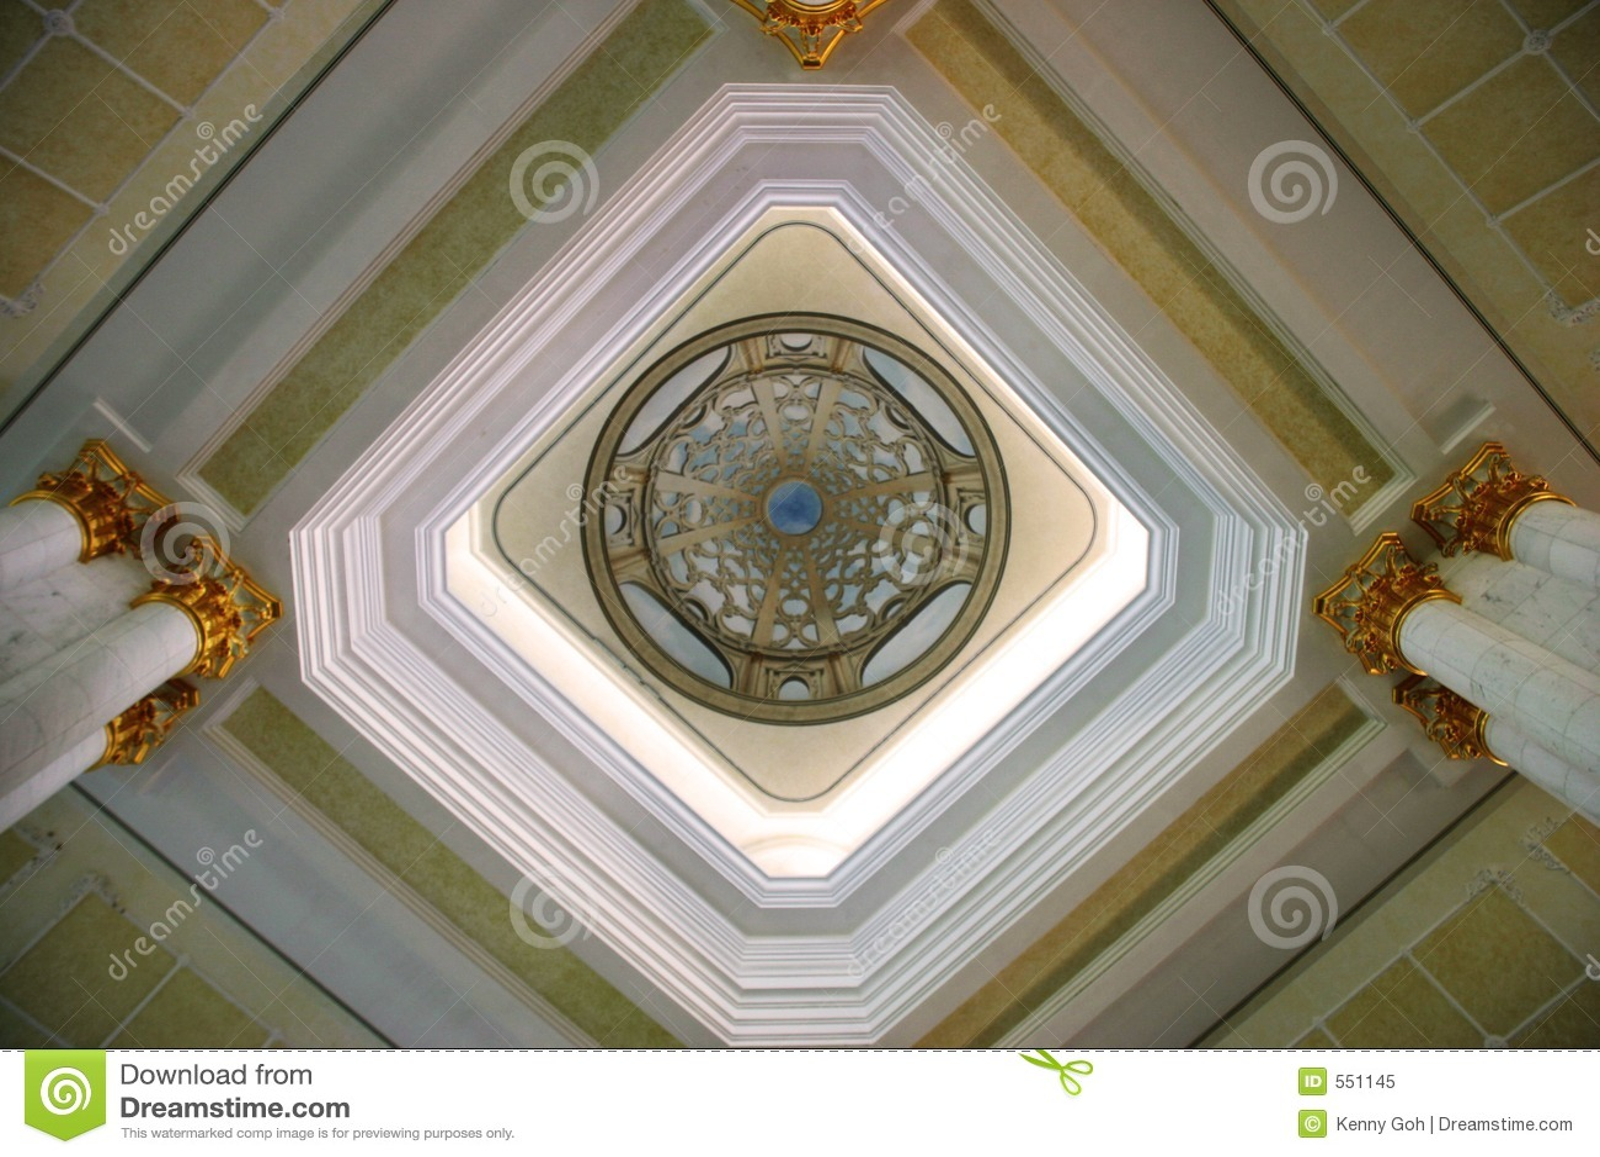 Artistic ceiling design stock image image of islam for Plaster ceiling design price